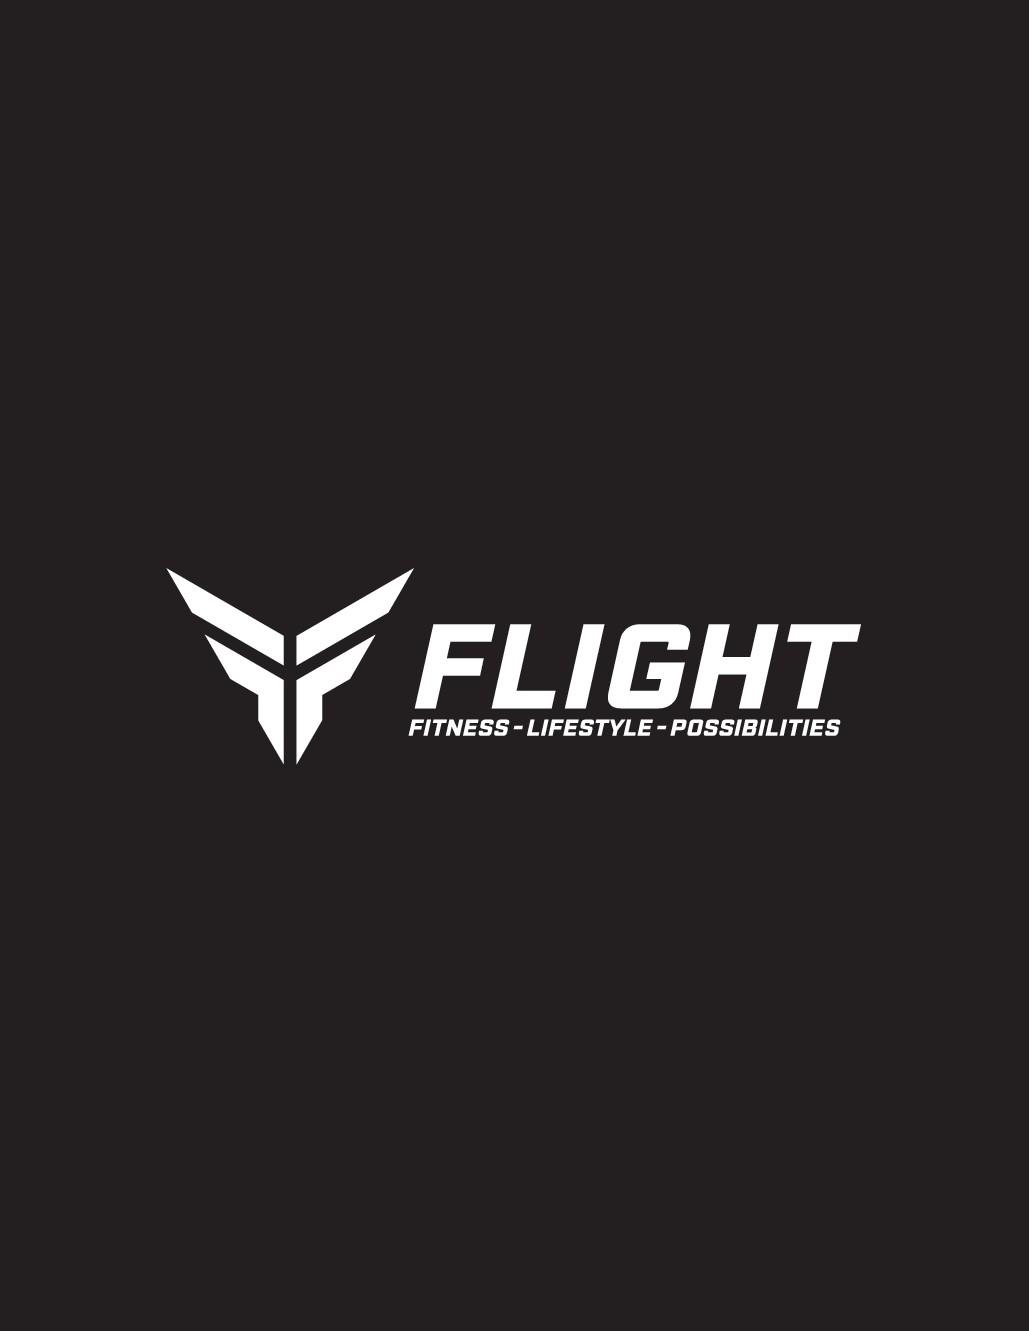 Lifestyle Fitness company needs a powerful logo